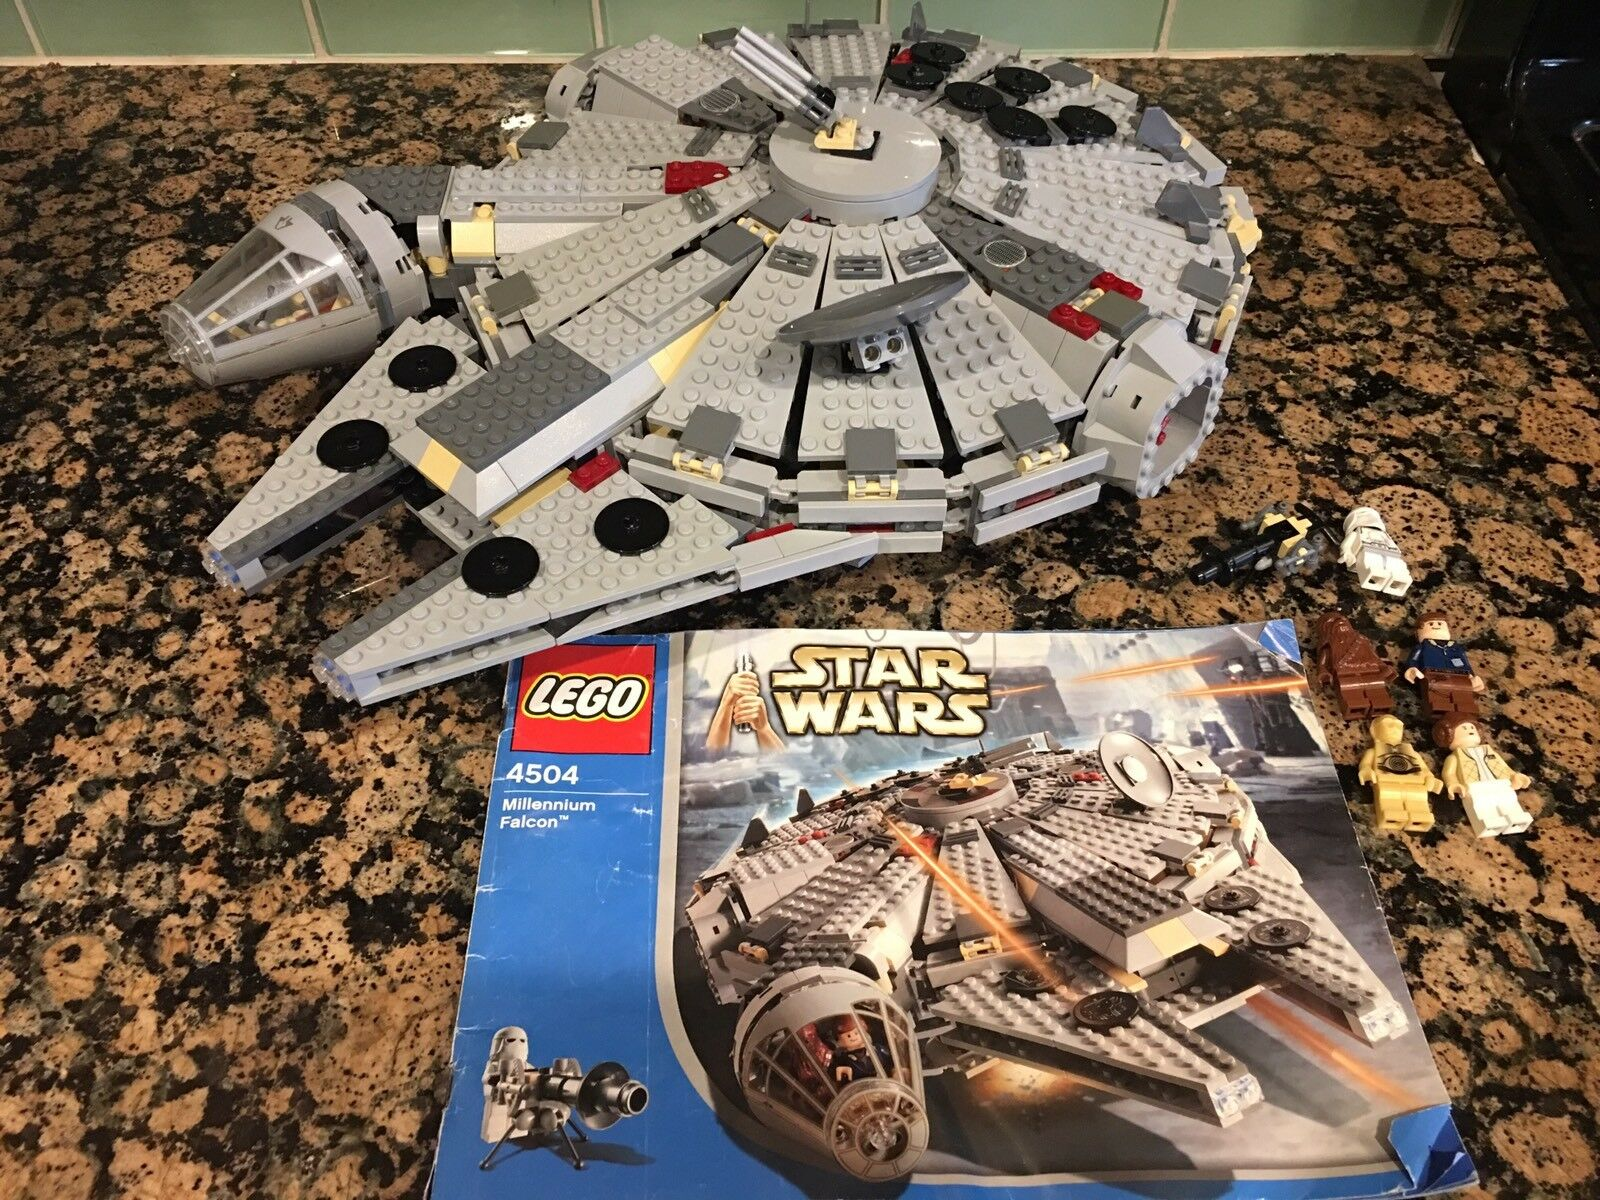 LEGO Star Wars Millennium Falcon 2004  4504  W/ Instructions & Minifigures